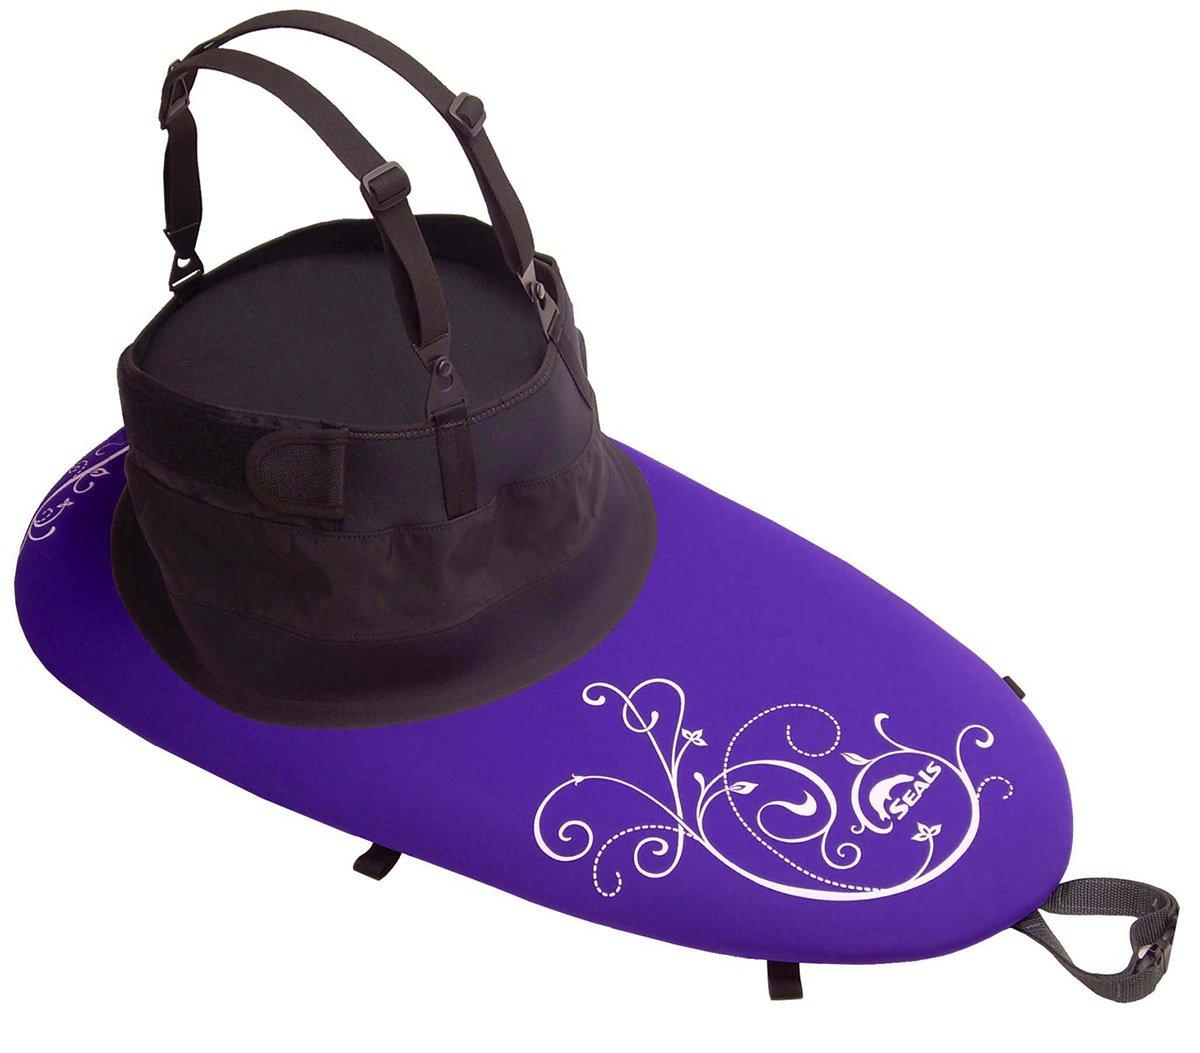 SEALS Calypso Sprayskirt, 1. Purple One Size